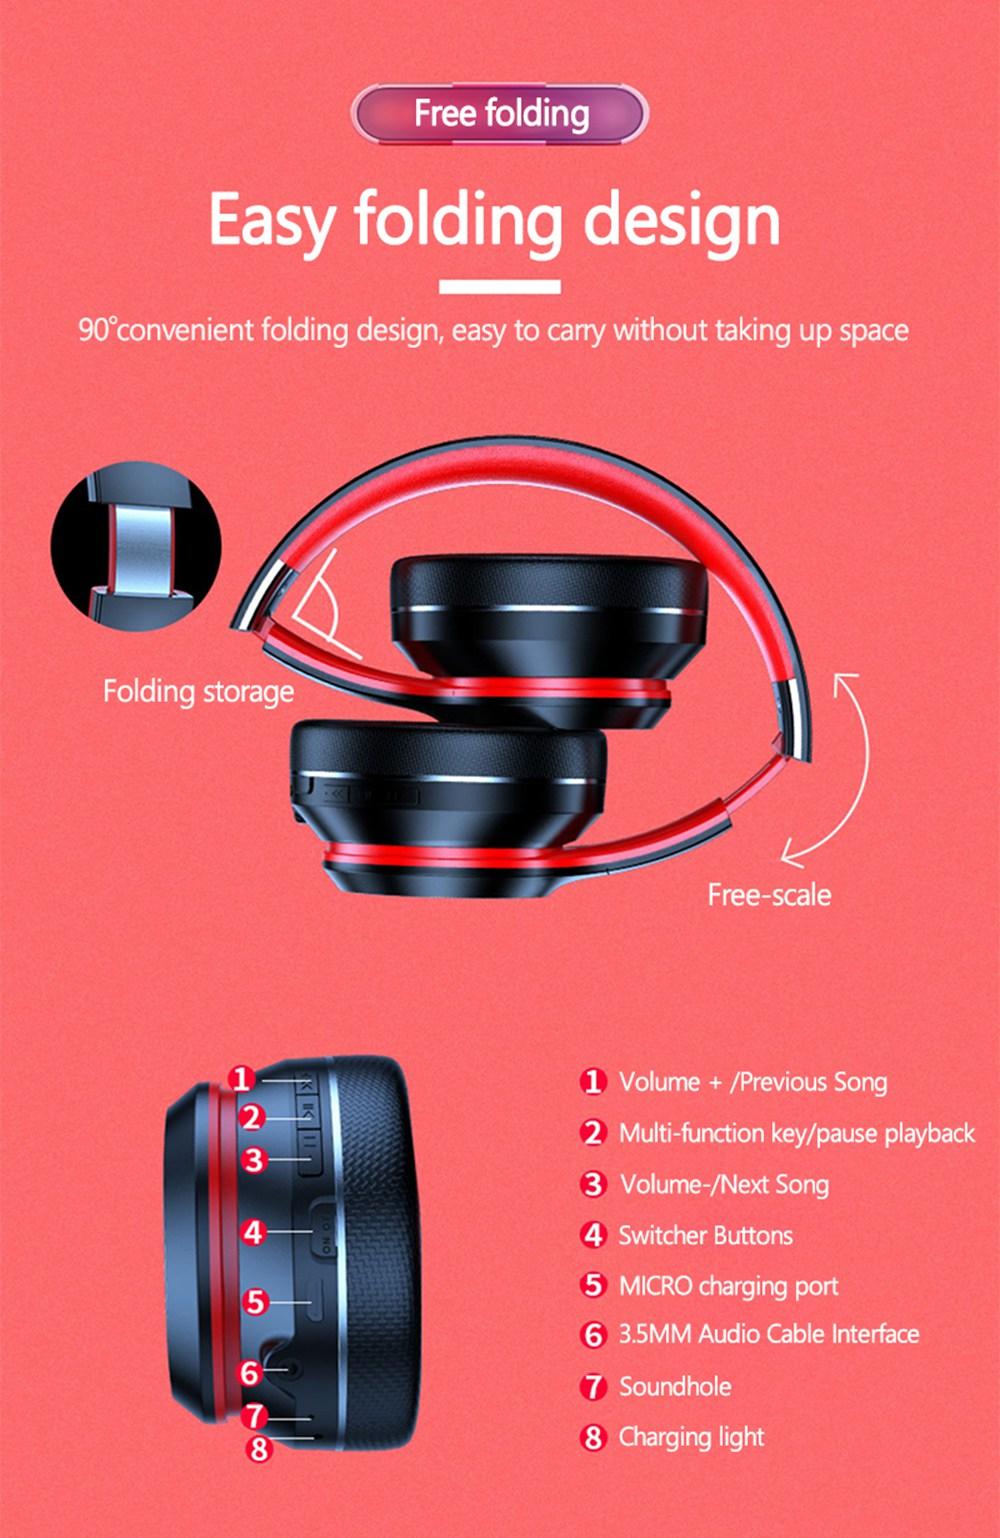 Lenovo HD200 Bluetooth Draadloze Stereo Hoofdtelefoon BT5.0 Lange Standby Leven Met Noise Cancelling Voor Xiaomi Iphone Lenovo Headset 18